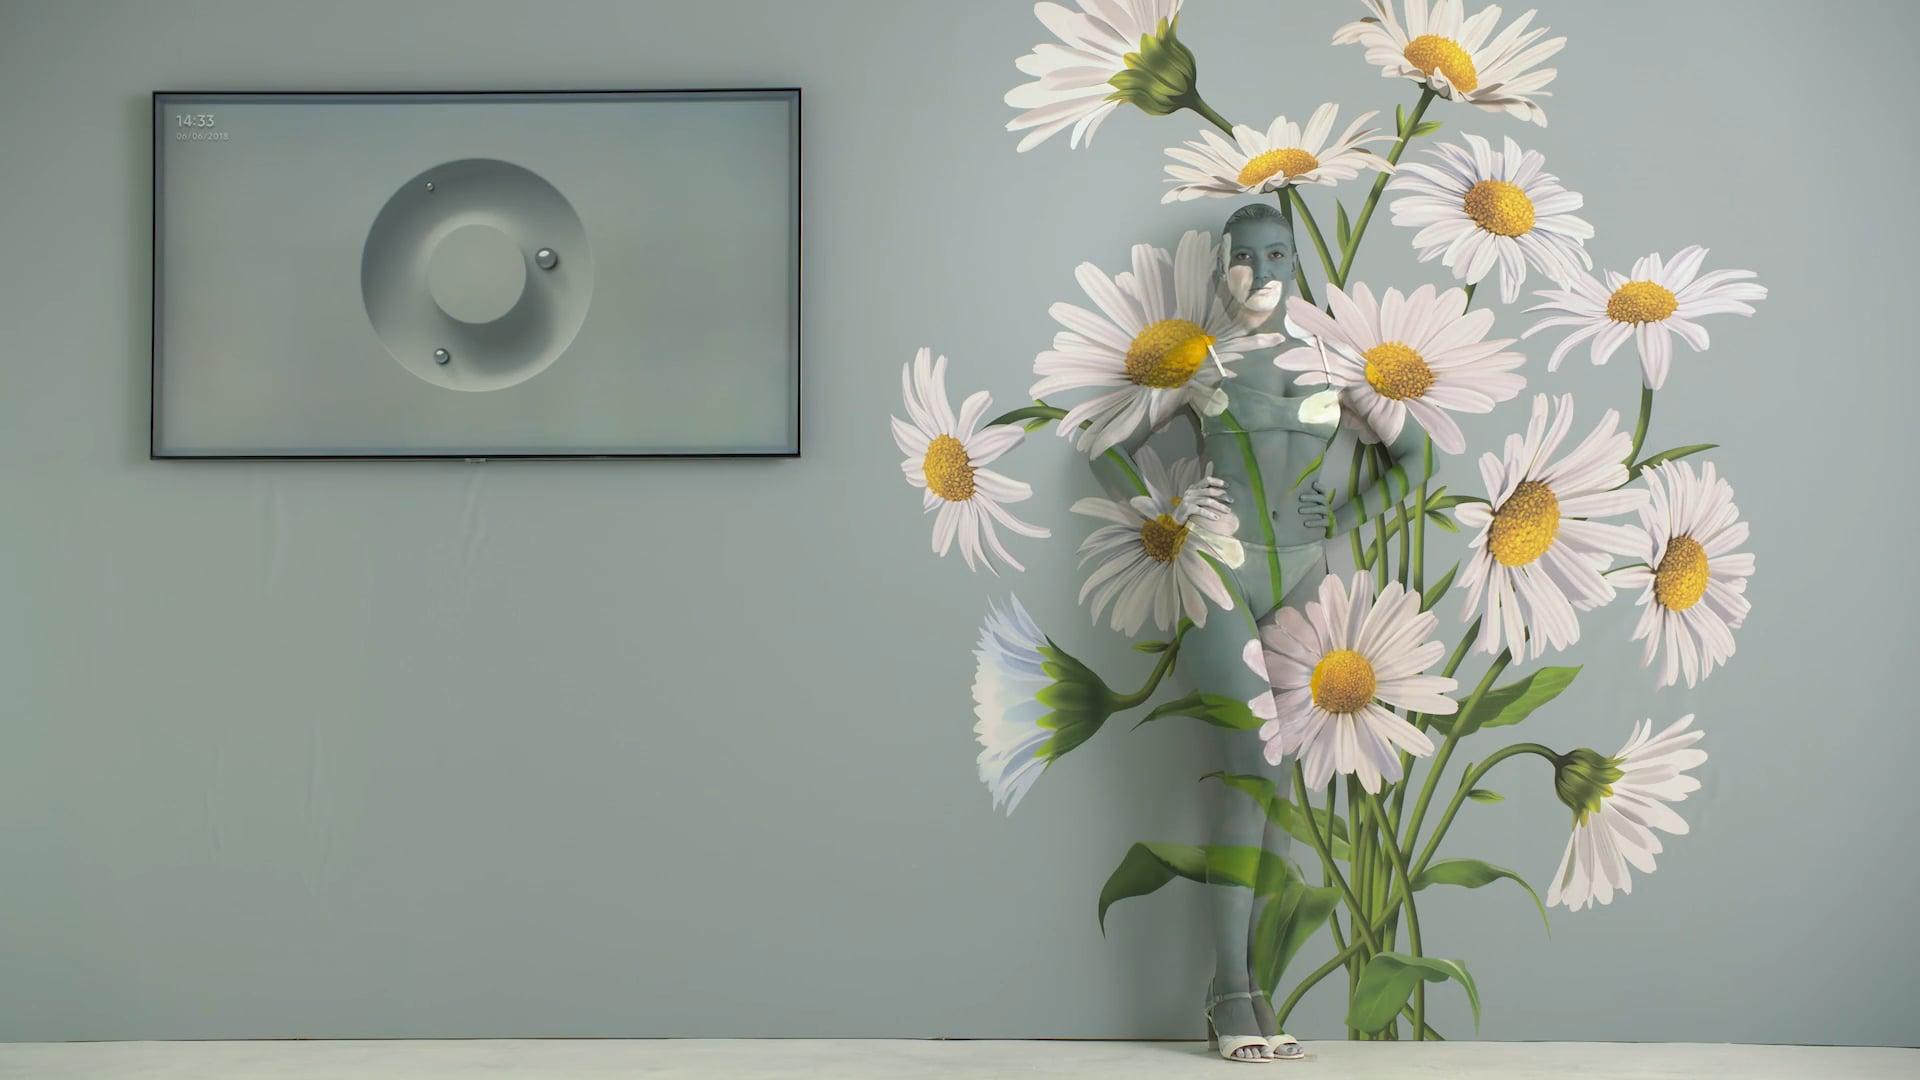 Samsung_Daisy Lowe Blending